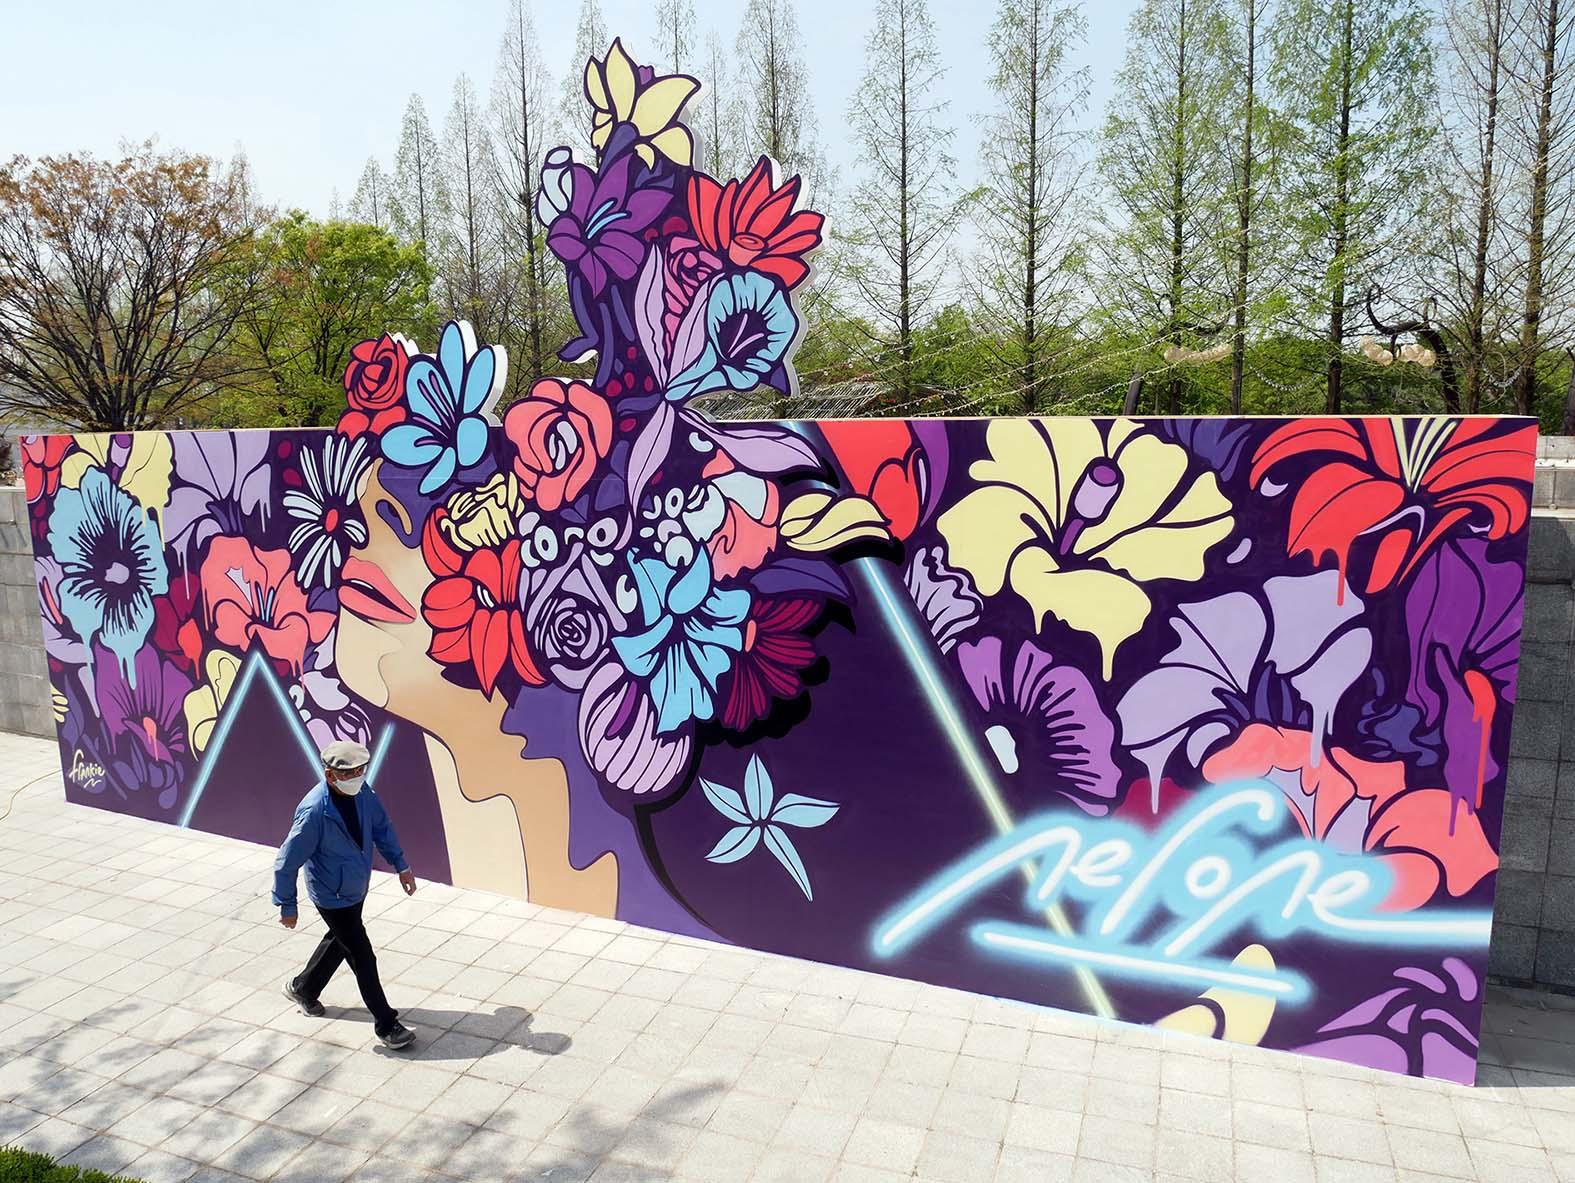 Nerone-street-art-seoul-korea 22